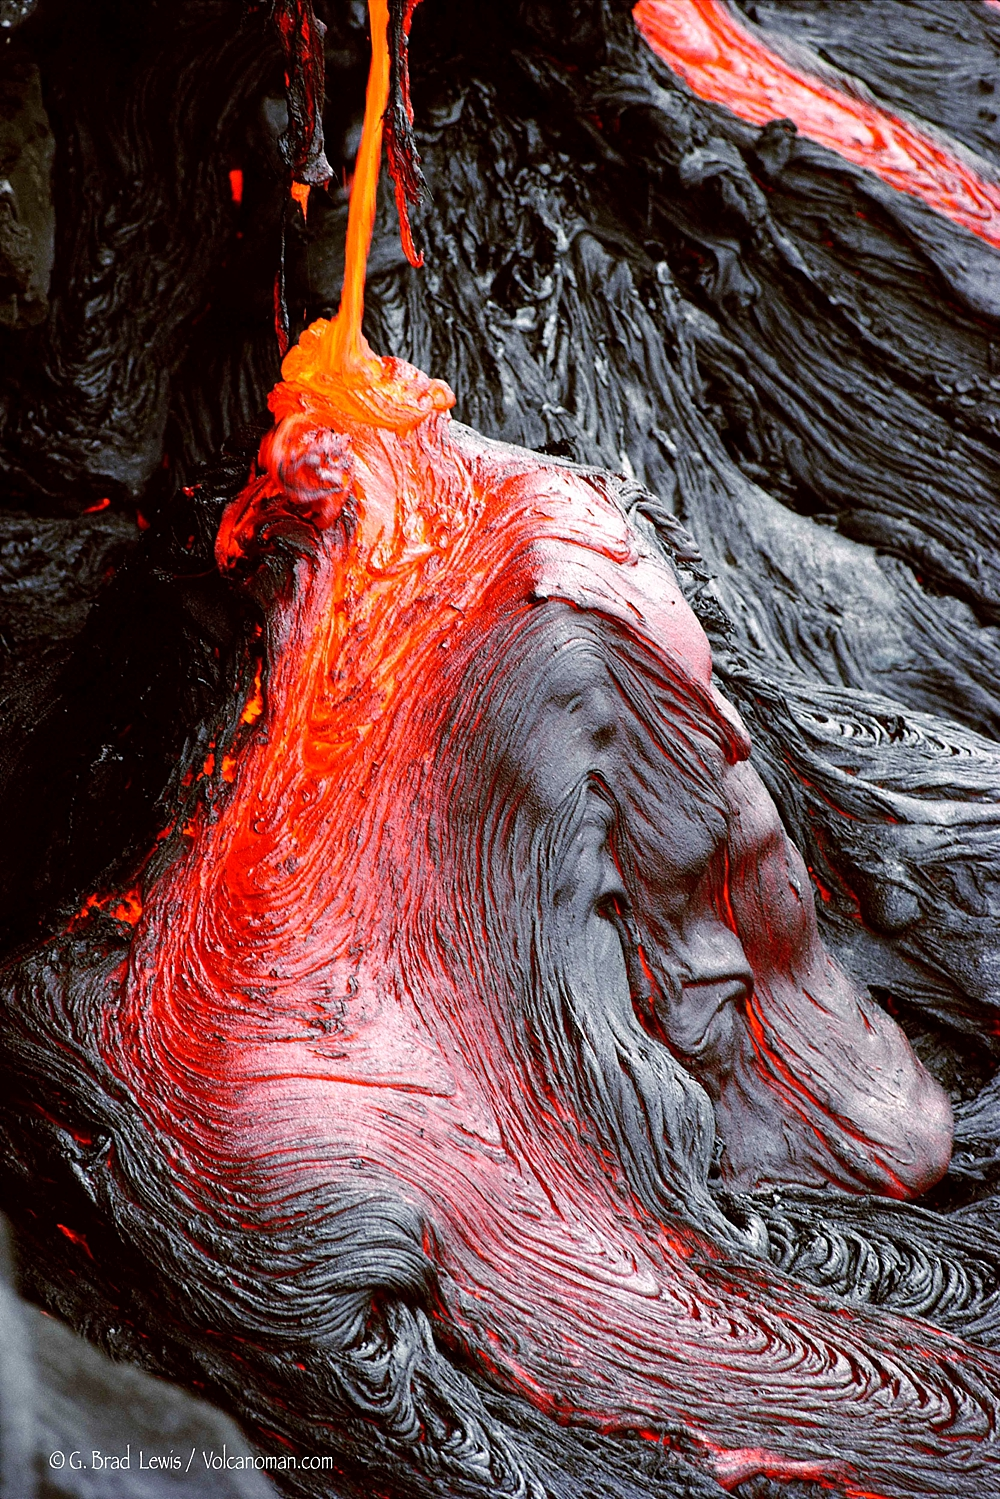 Lava Masquerade - Image by Brad Lewis